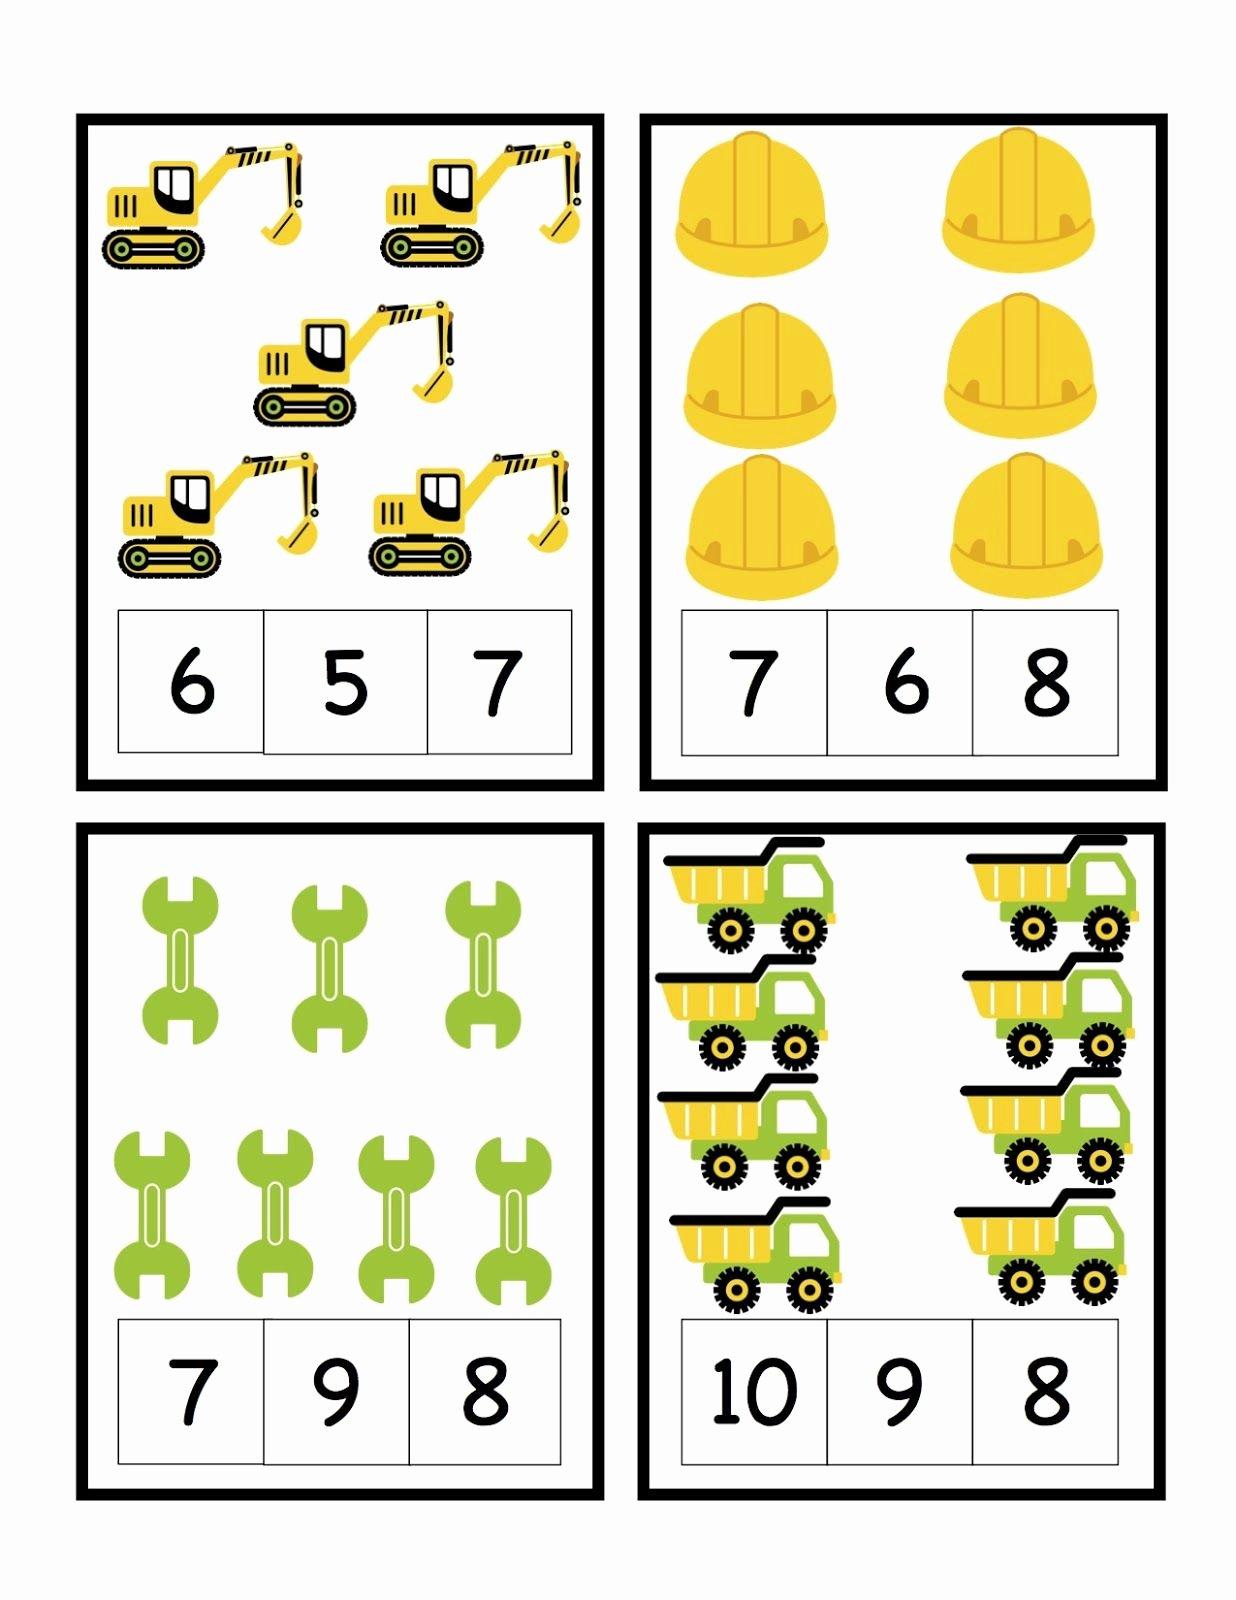 Construction Worksheets for Preschoolers Printable Preschool Printables Construction